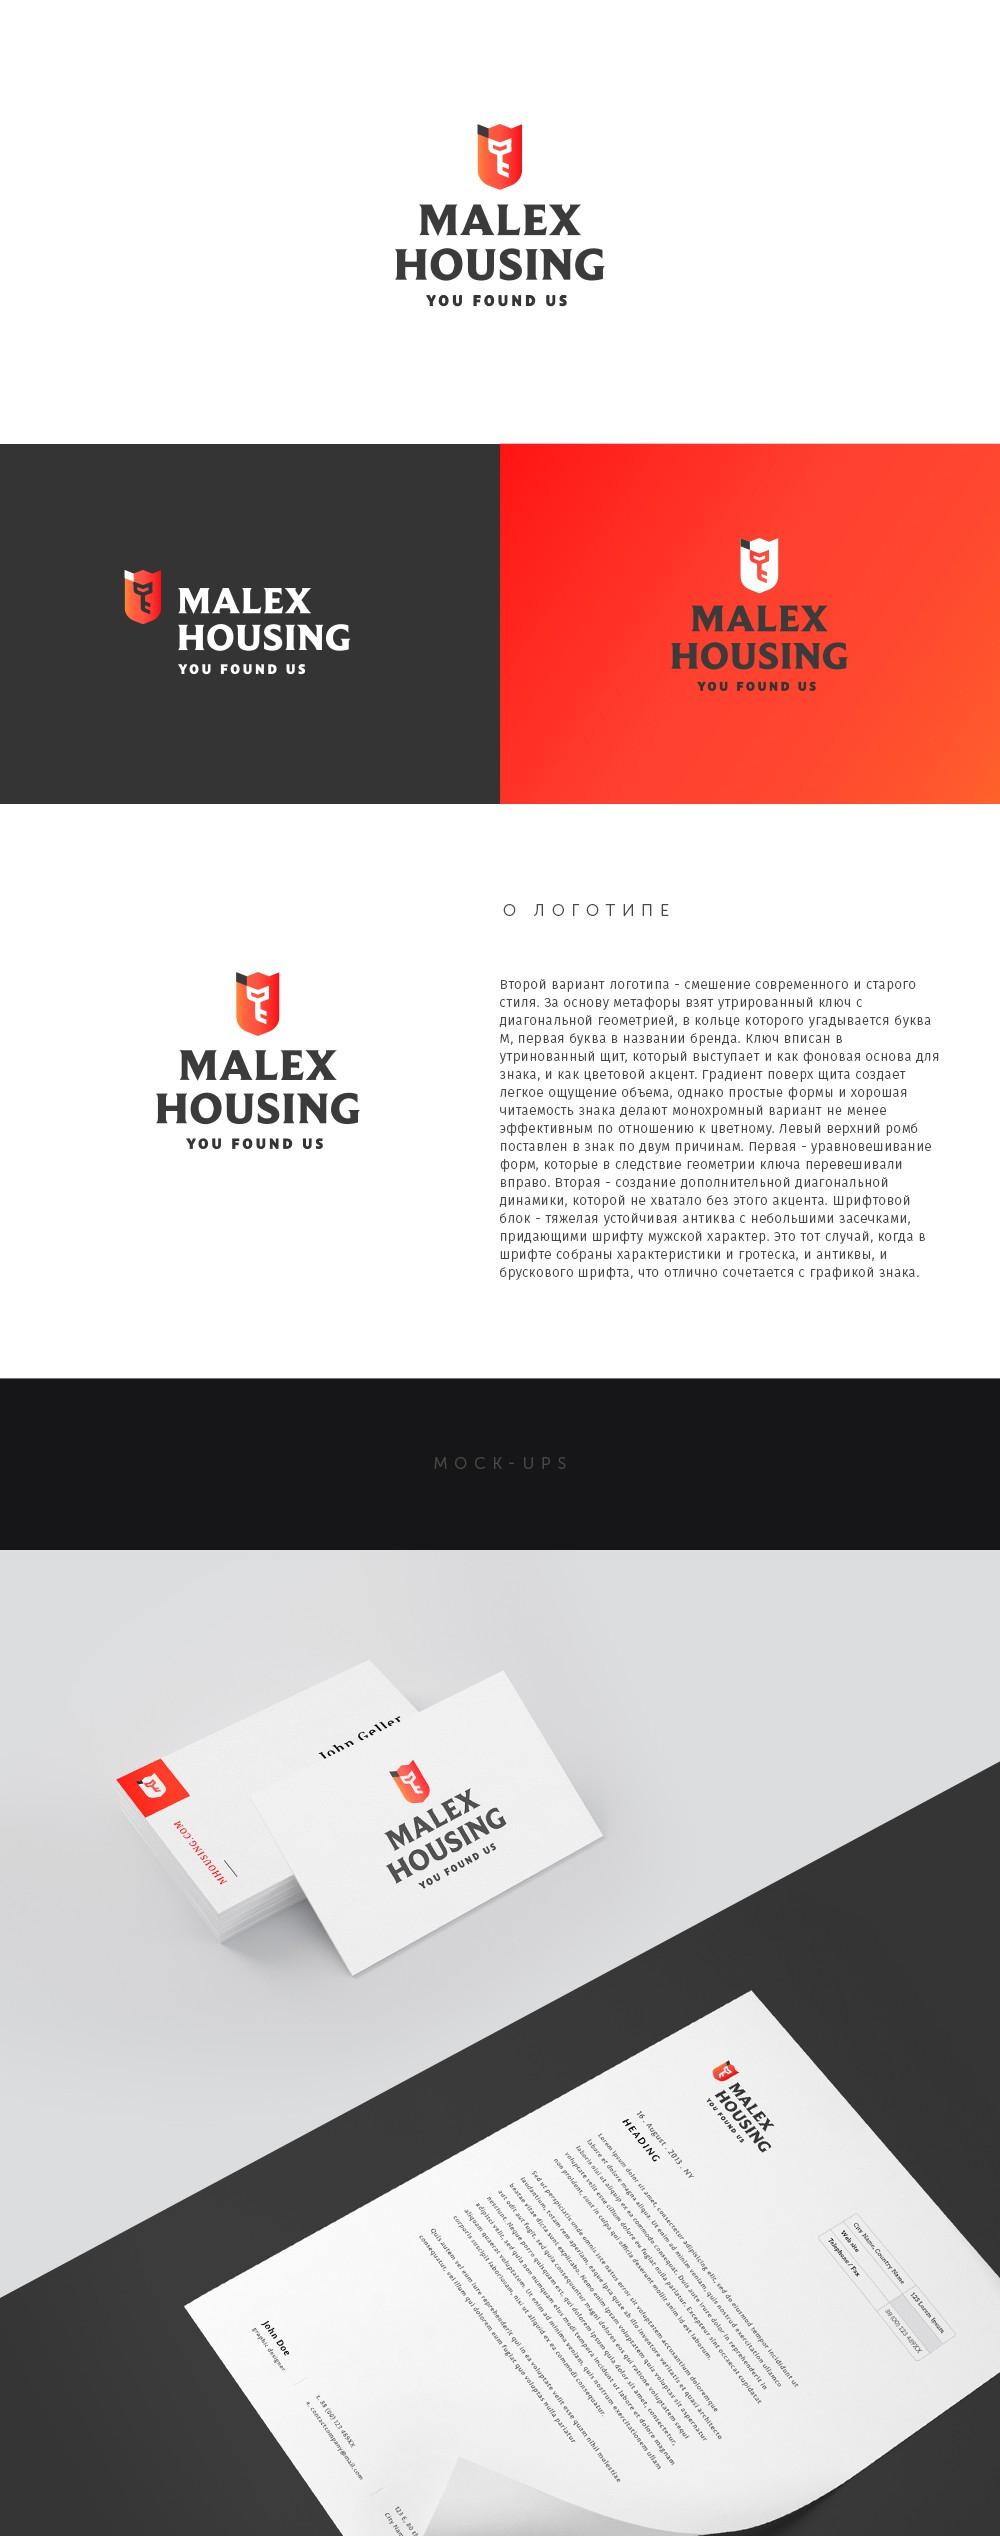 Malex Housing